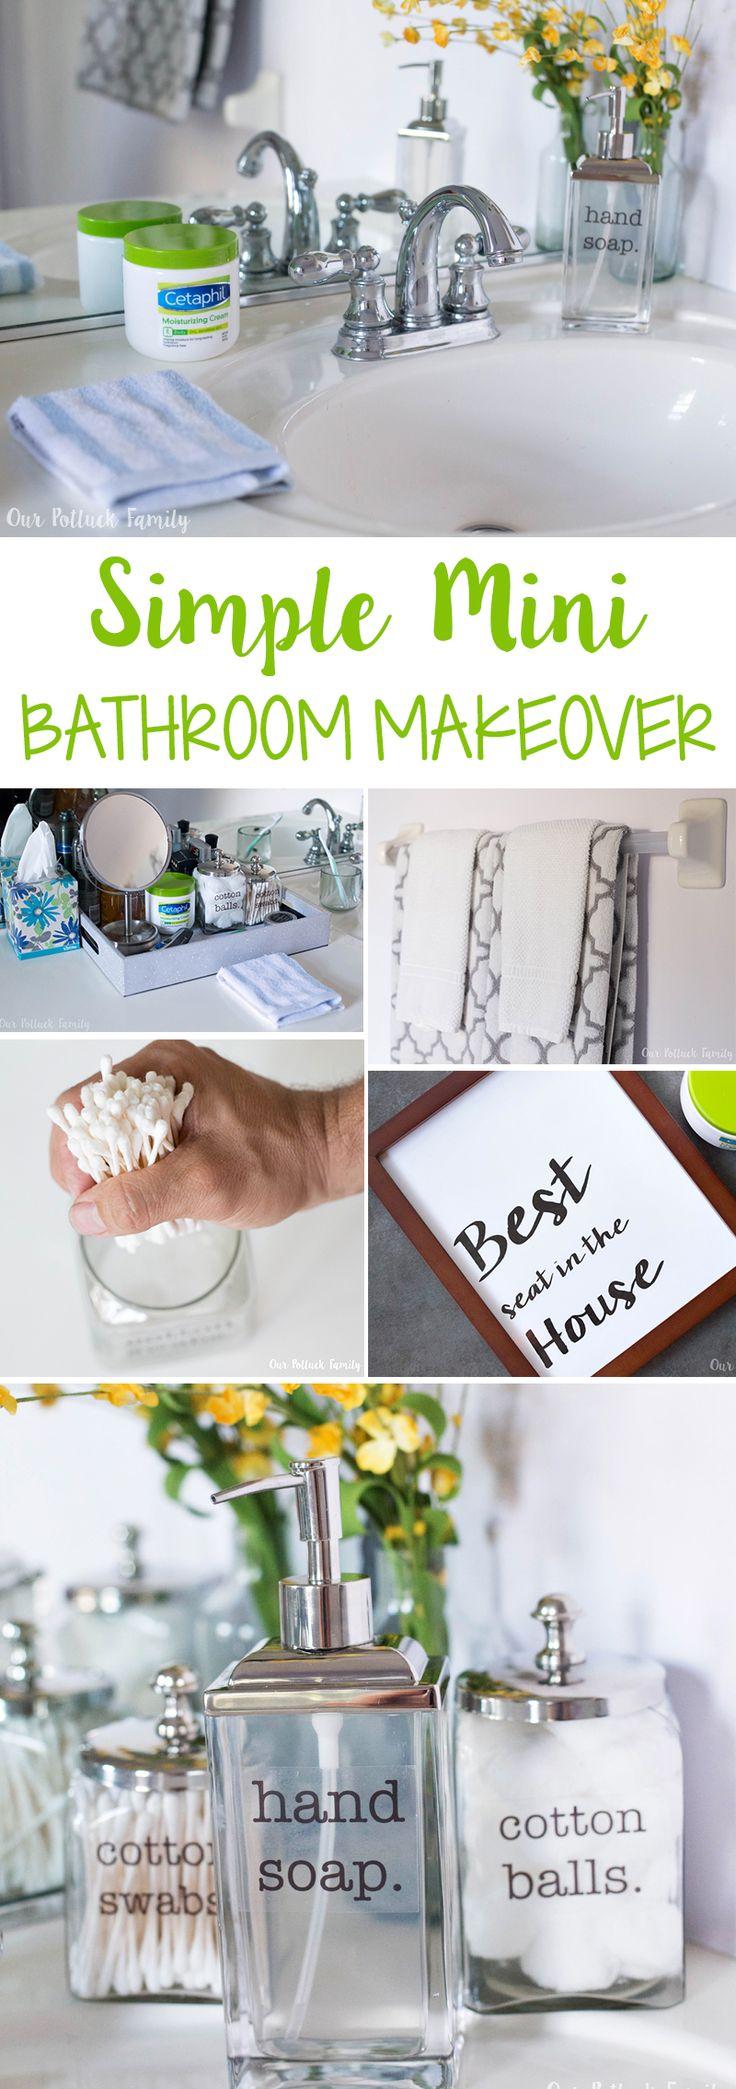 Bathroom Makeover Johannesburg the 25+ best ideas about simple bathroom makeover on pinterest